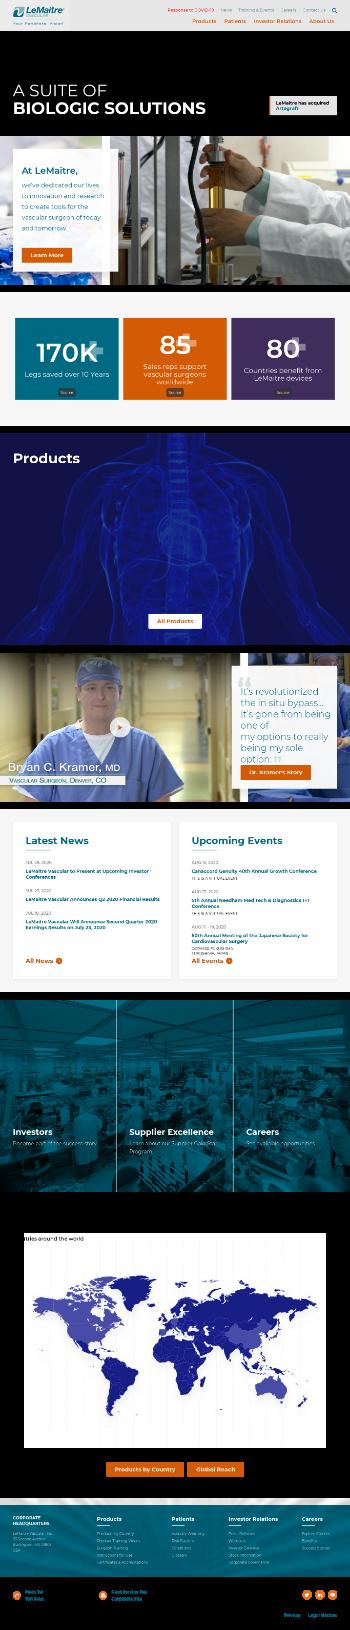 LeMaitre Vascular, Inc. Website Screenshot